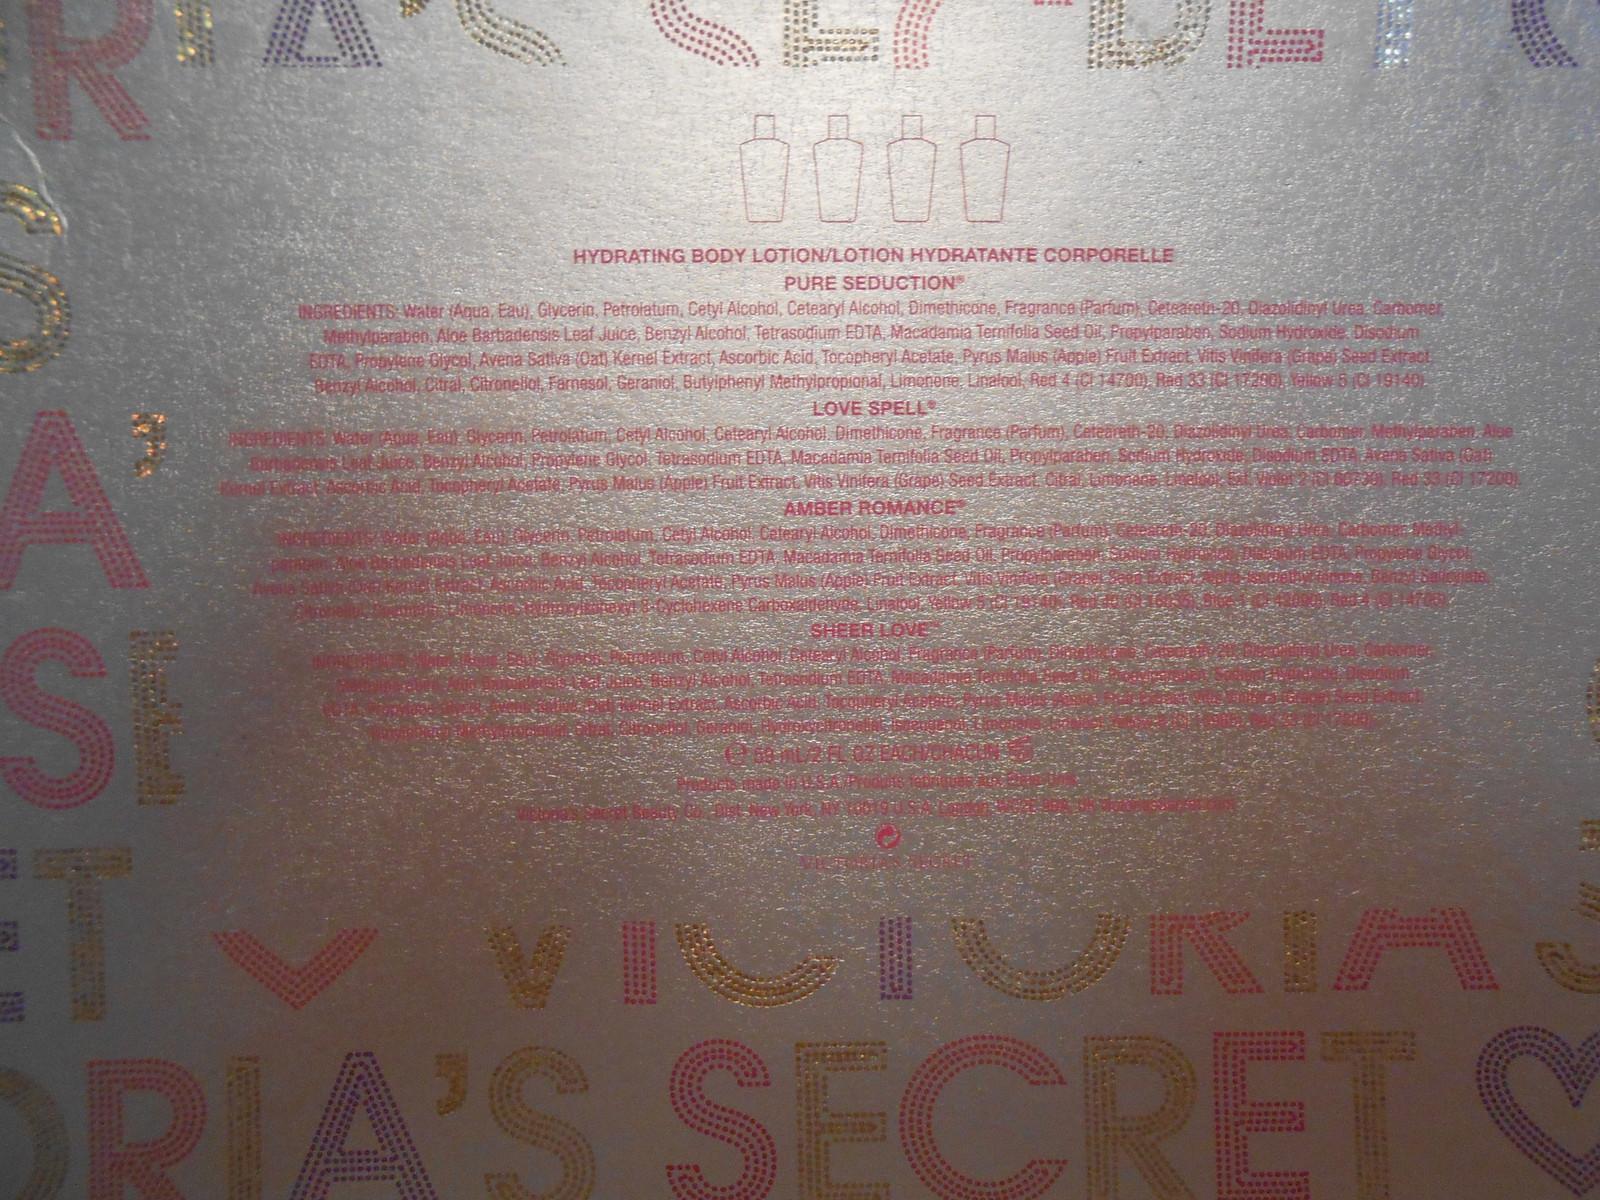 VICTORIA'S SECRET BODY LOTIONS (4) PIECE SET 2 OZ EACH NEW IN BOX image 3